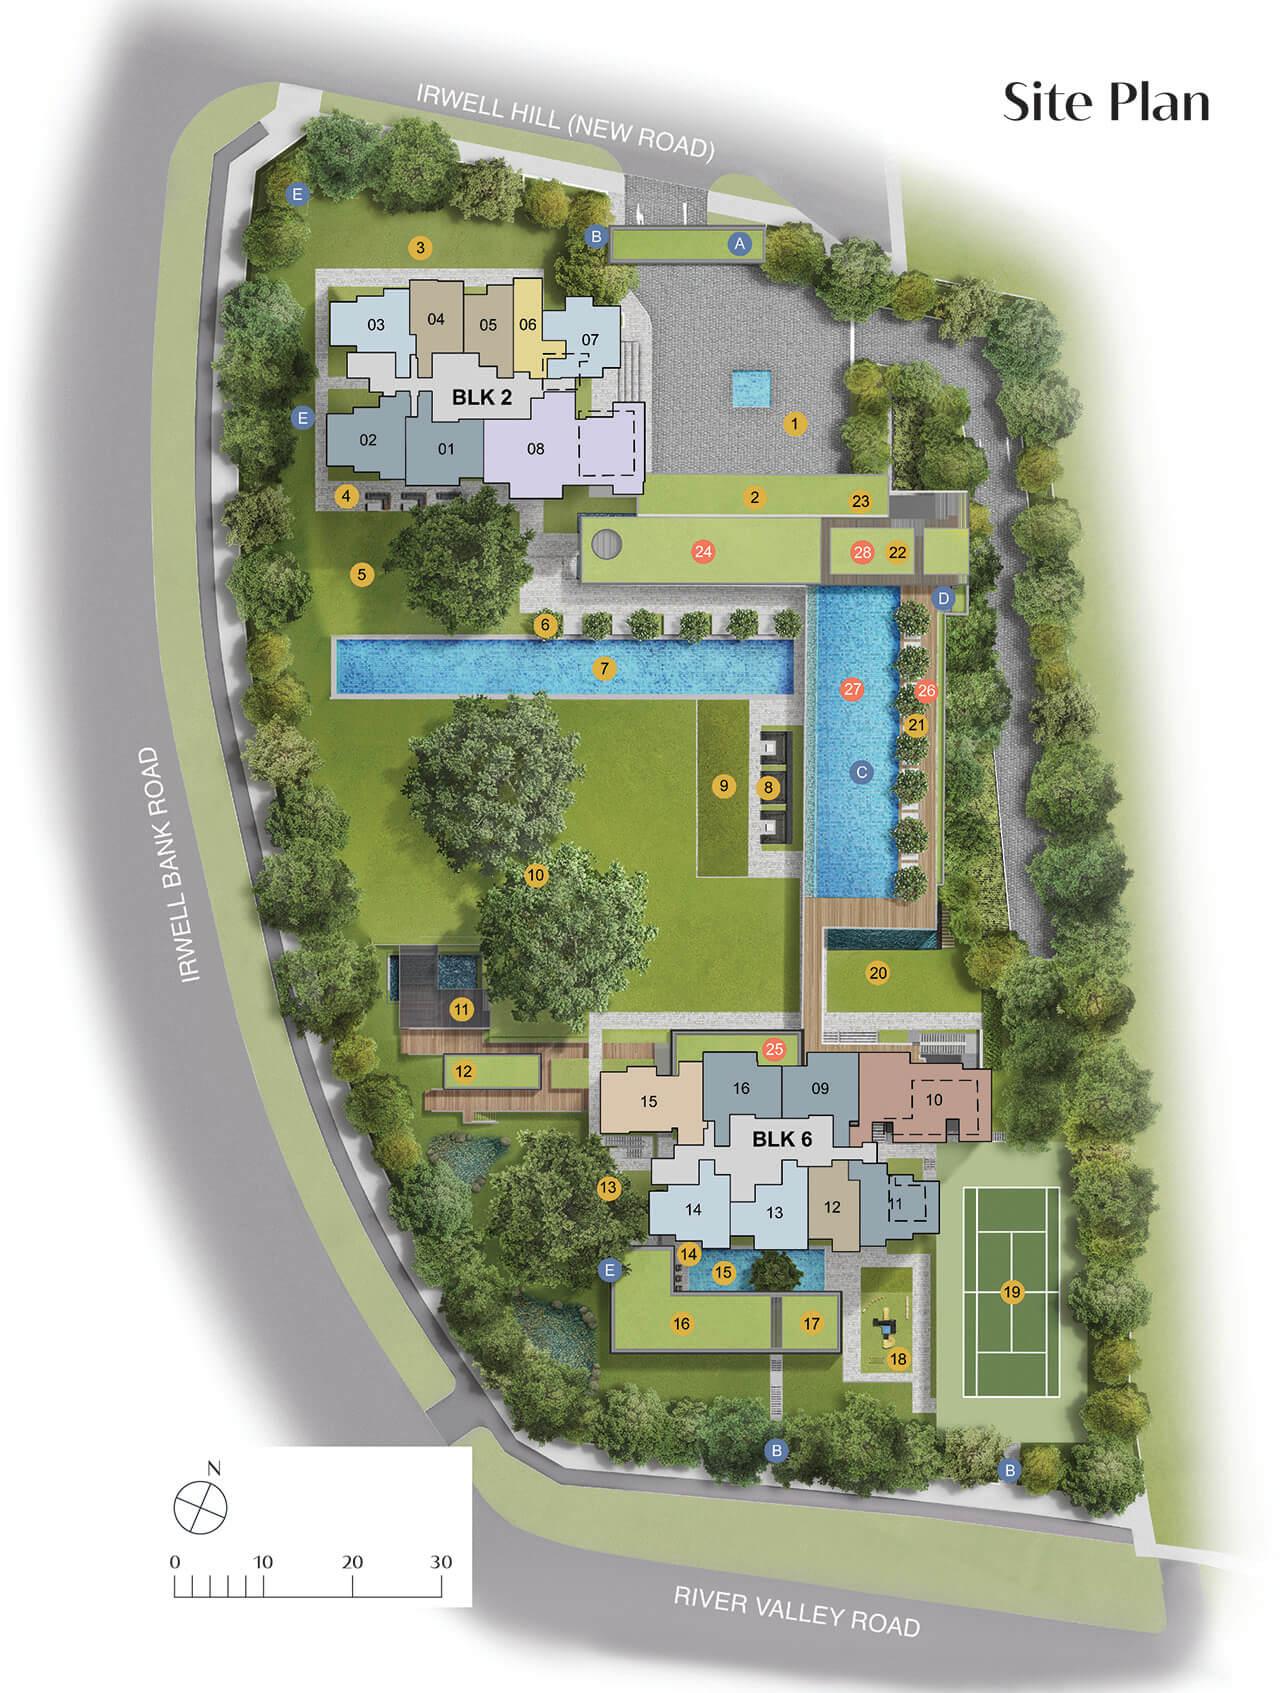 Irwell Hill Residences Siteplan